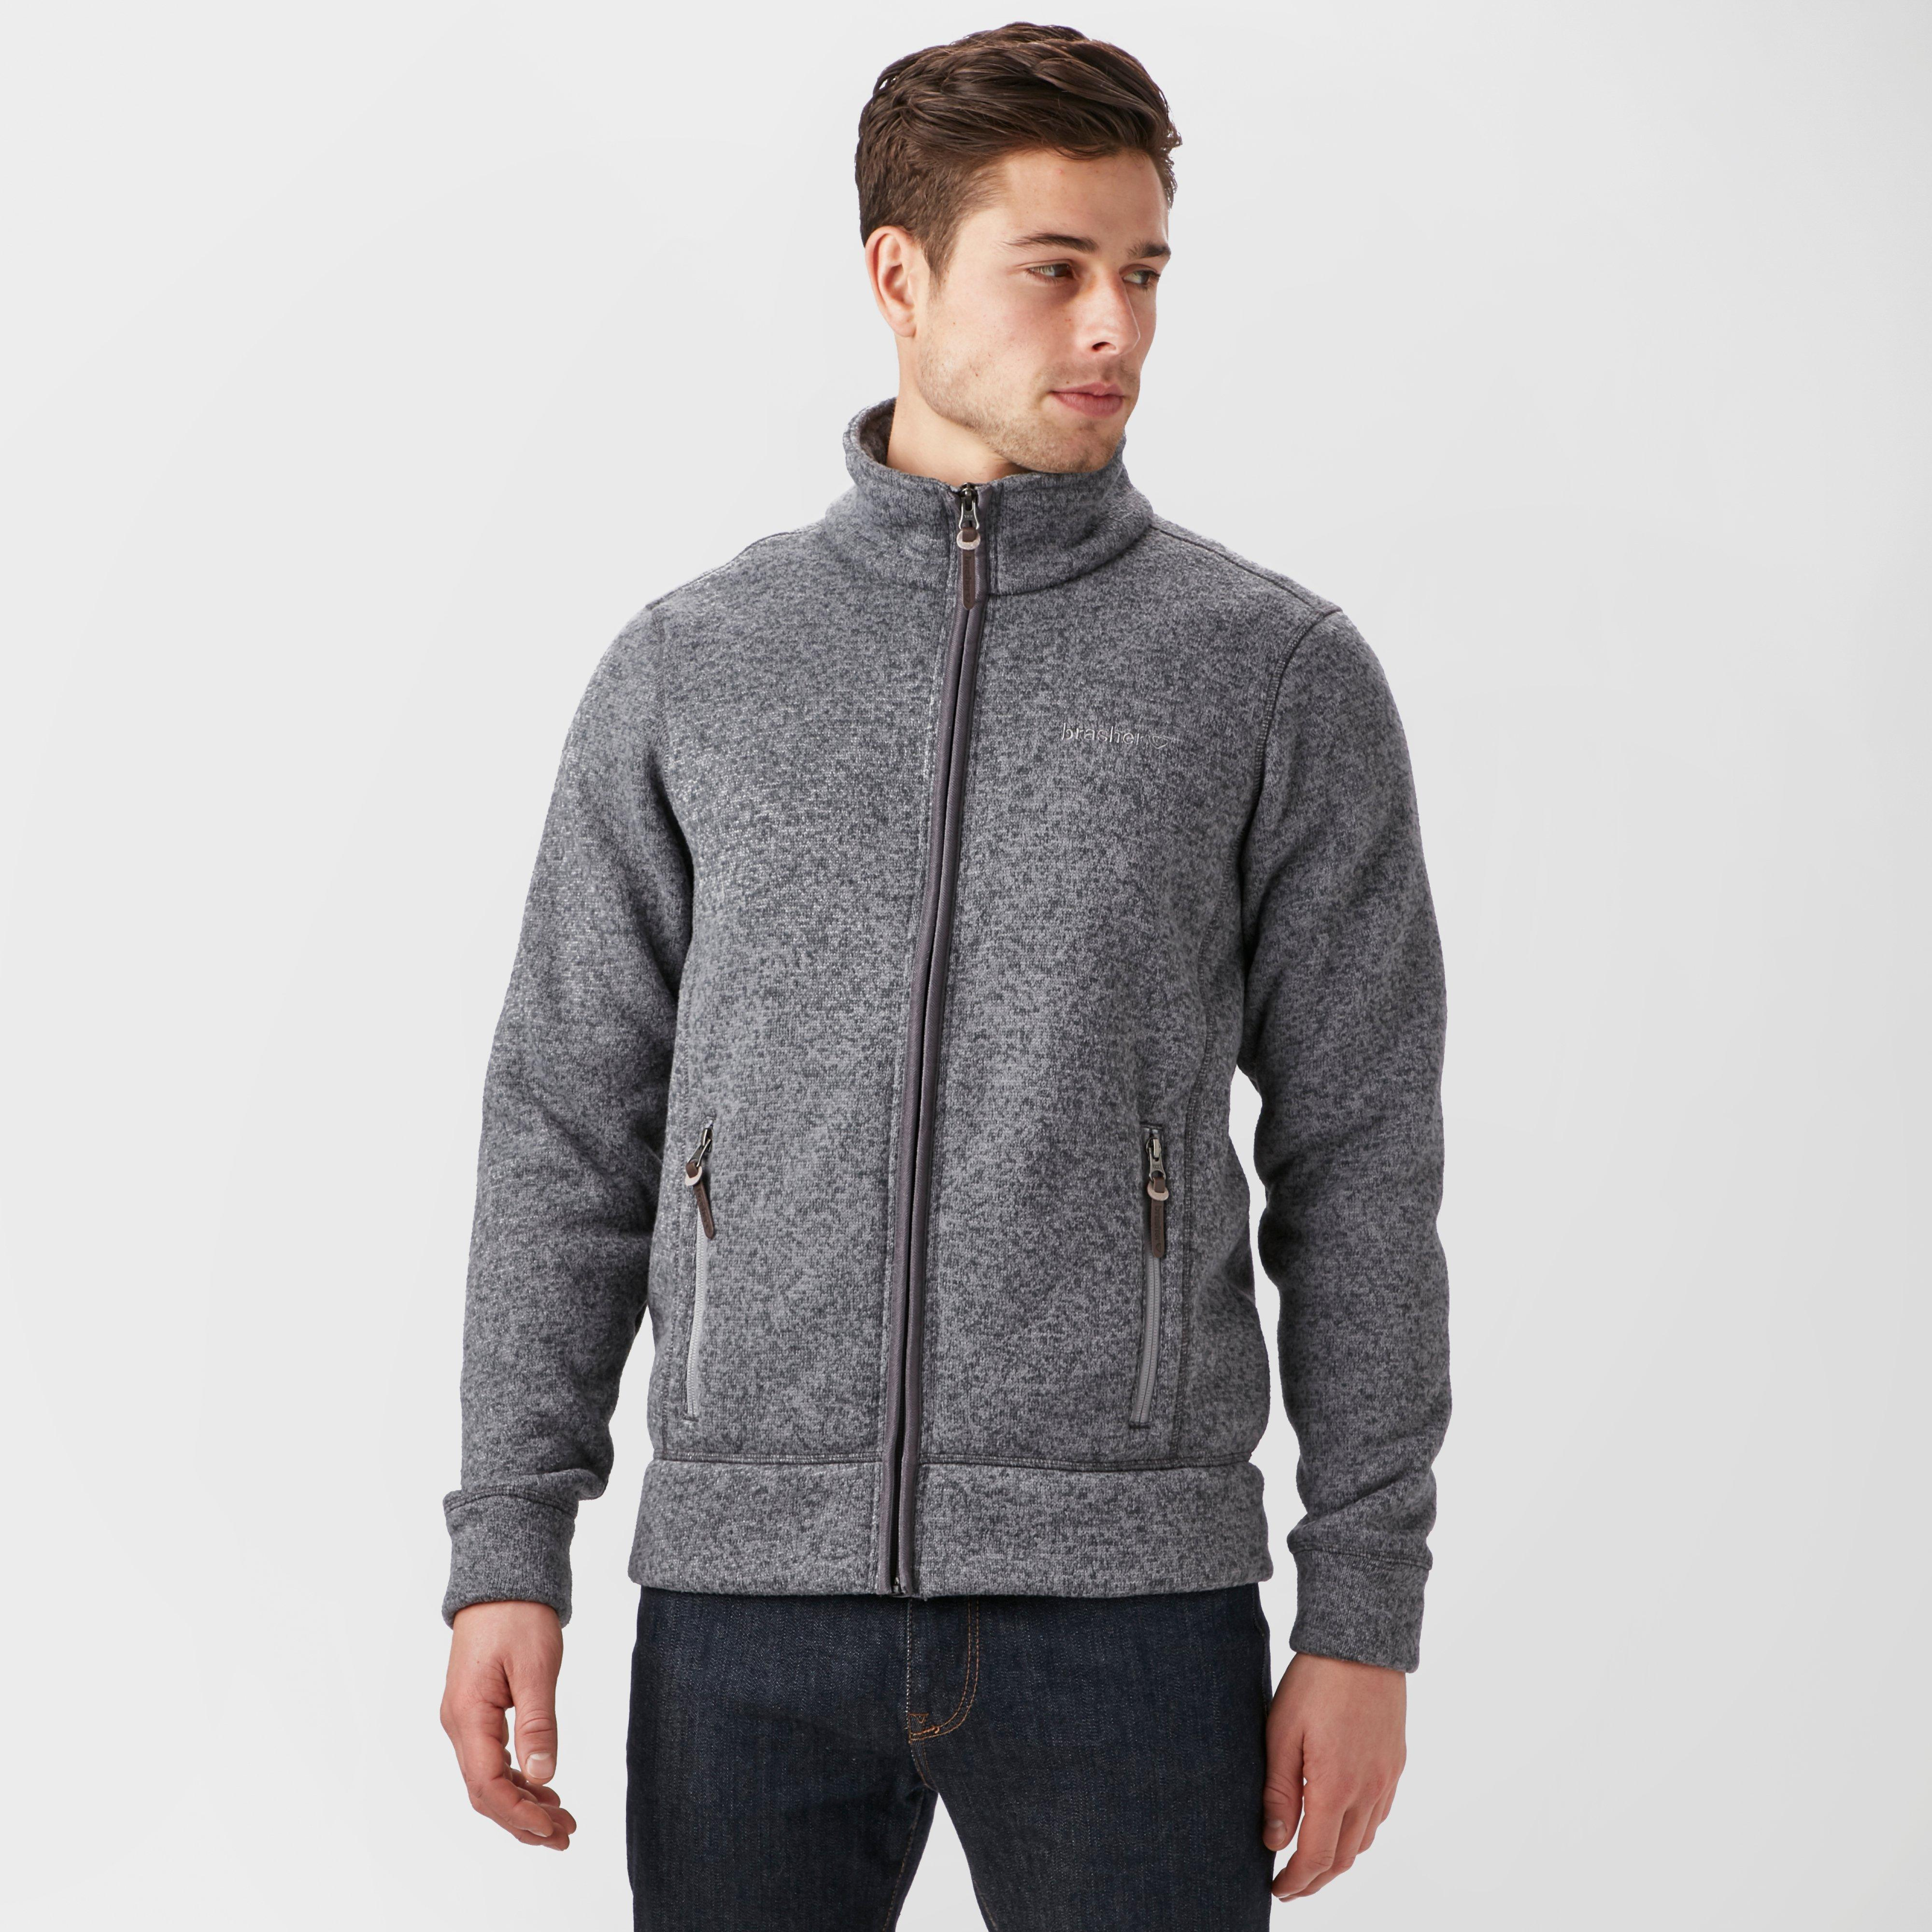 Brasher Mens Rydal Ii Fleece Jacket - Grey/mgy  Grey/mgy